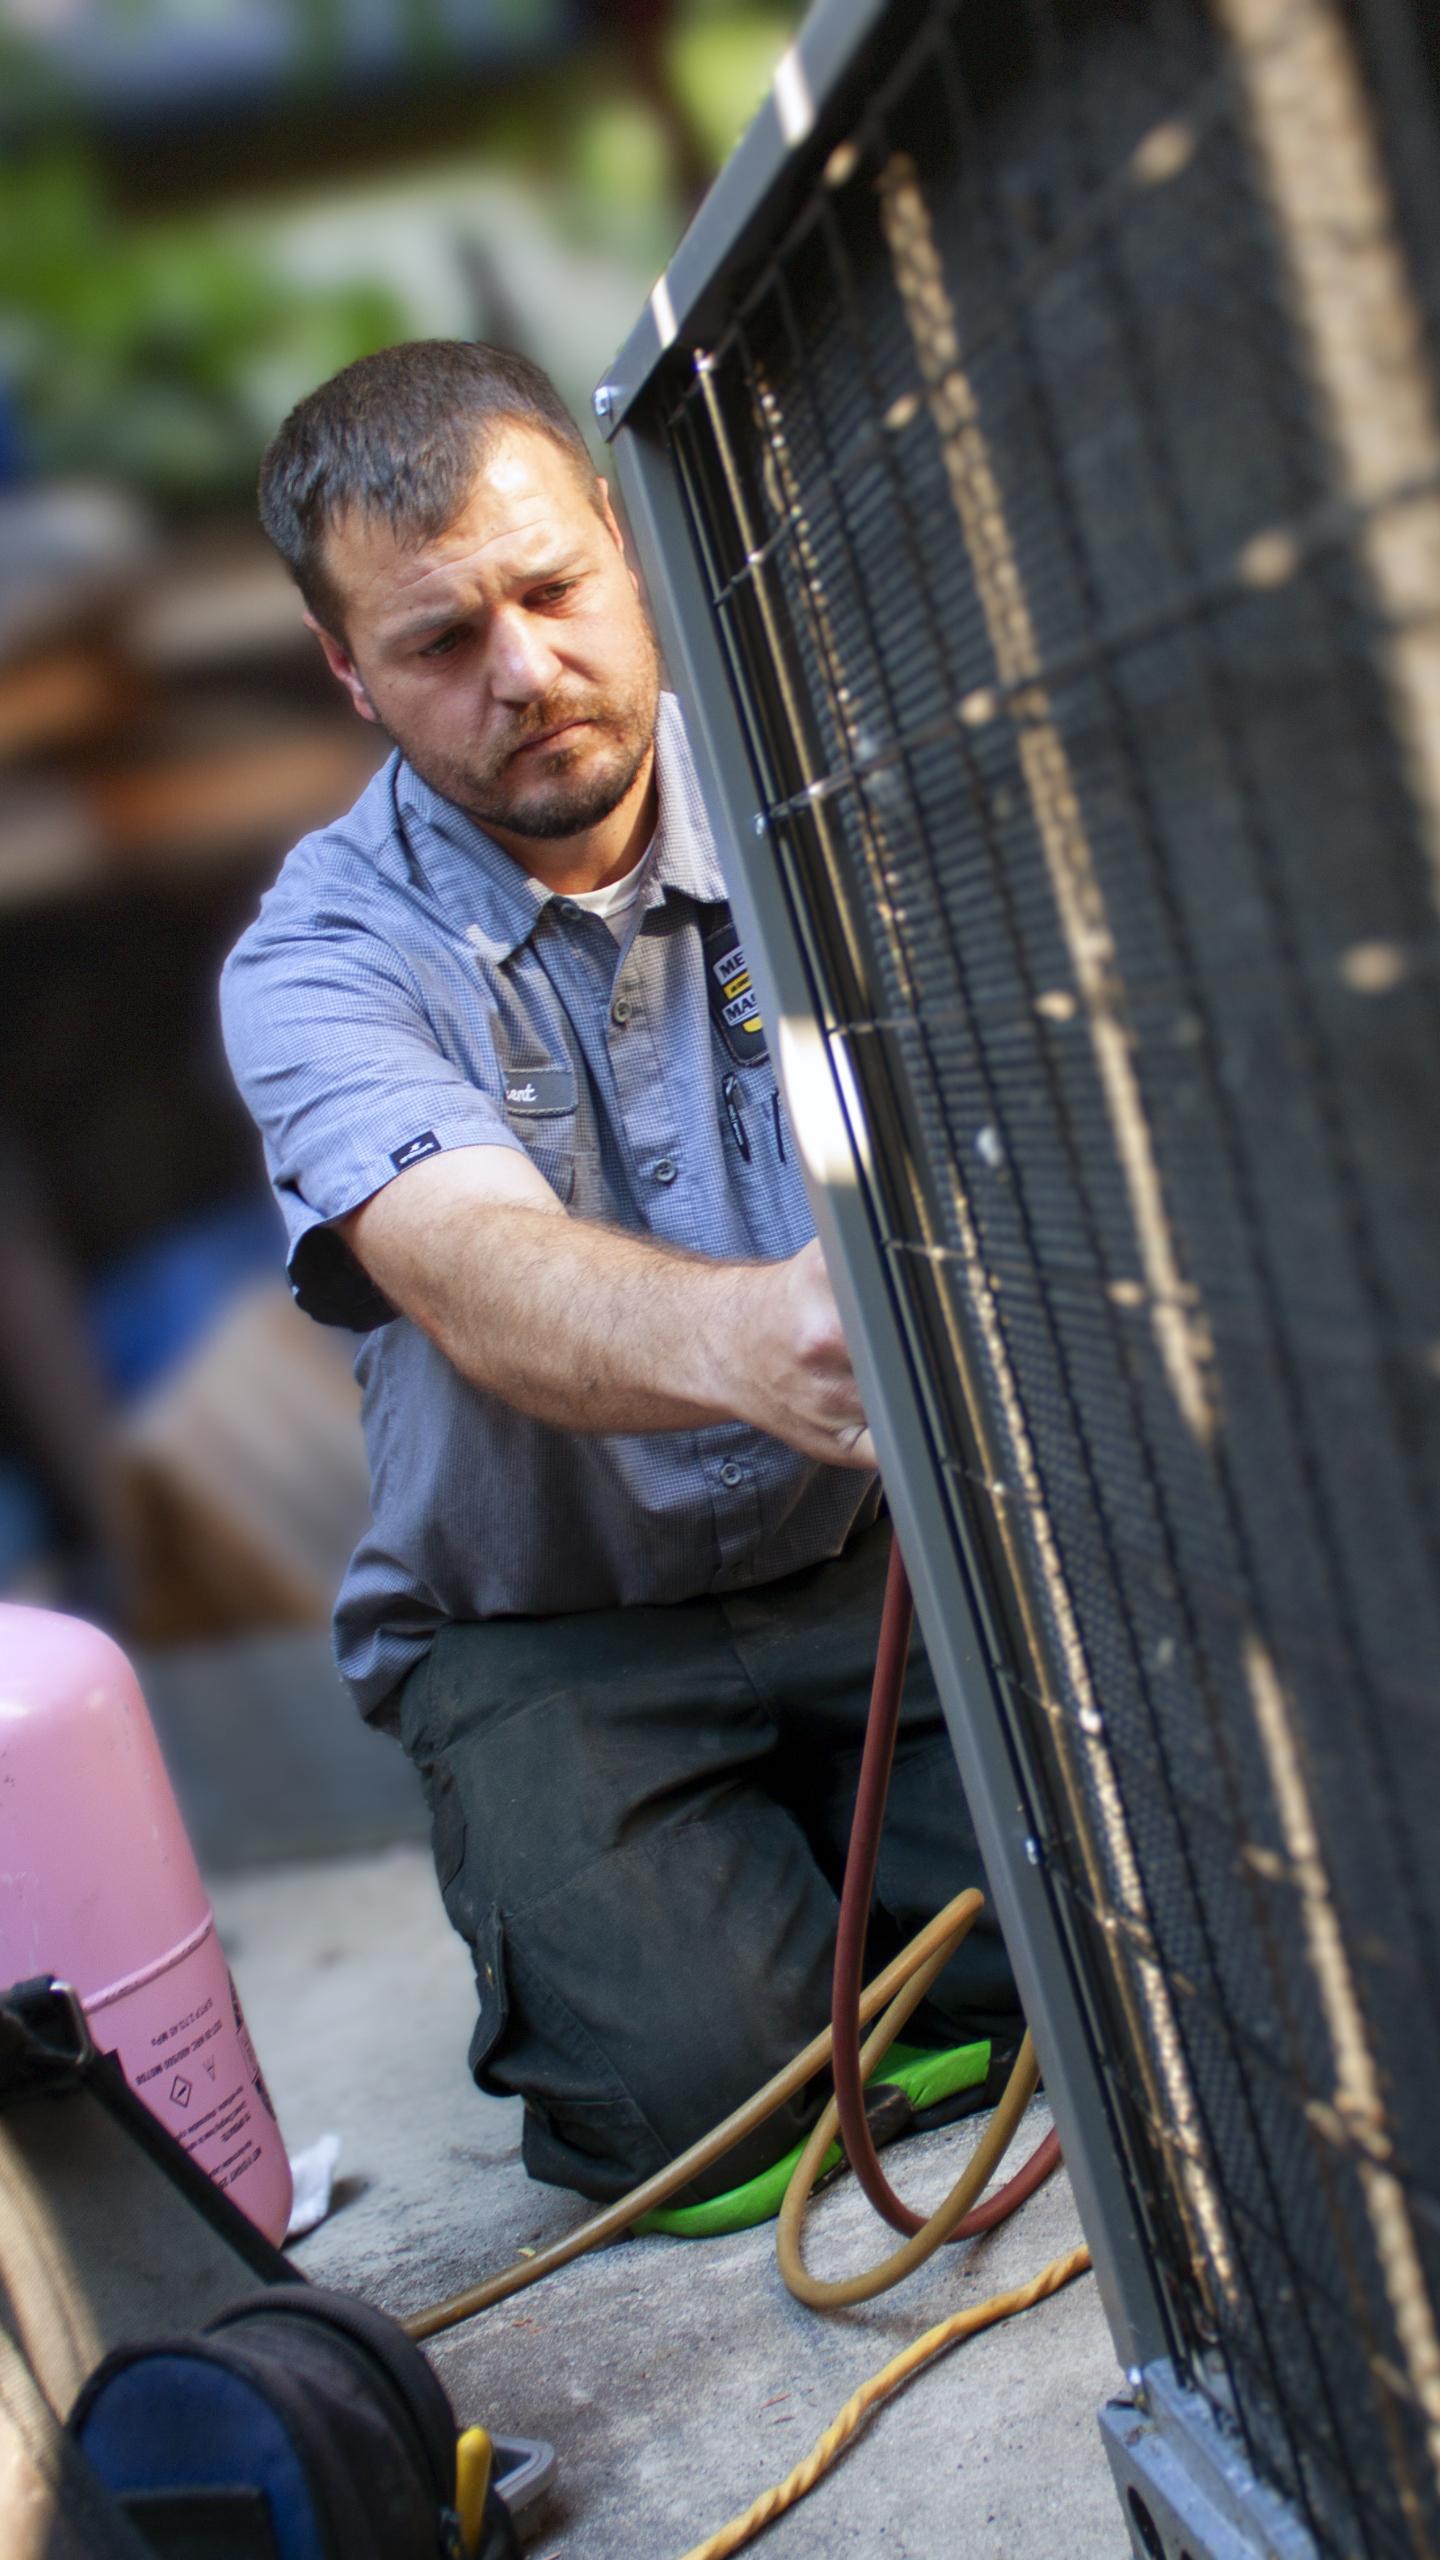 Service tech working on HVAC equipment